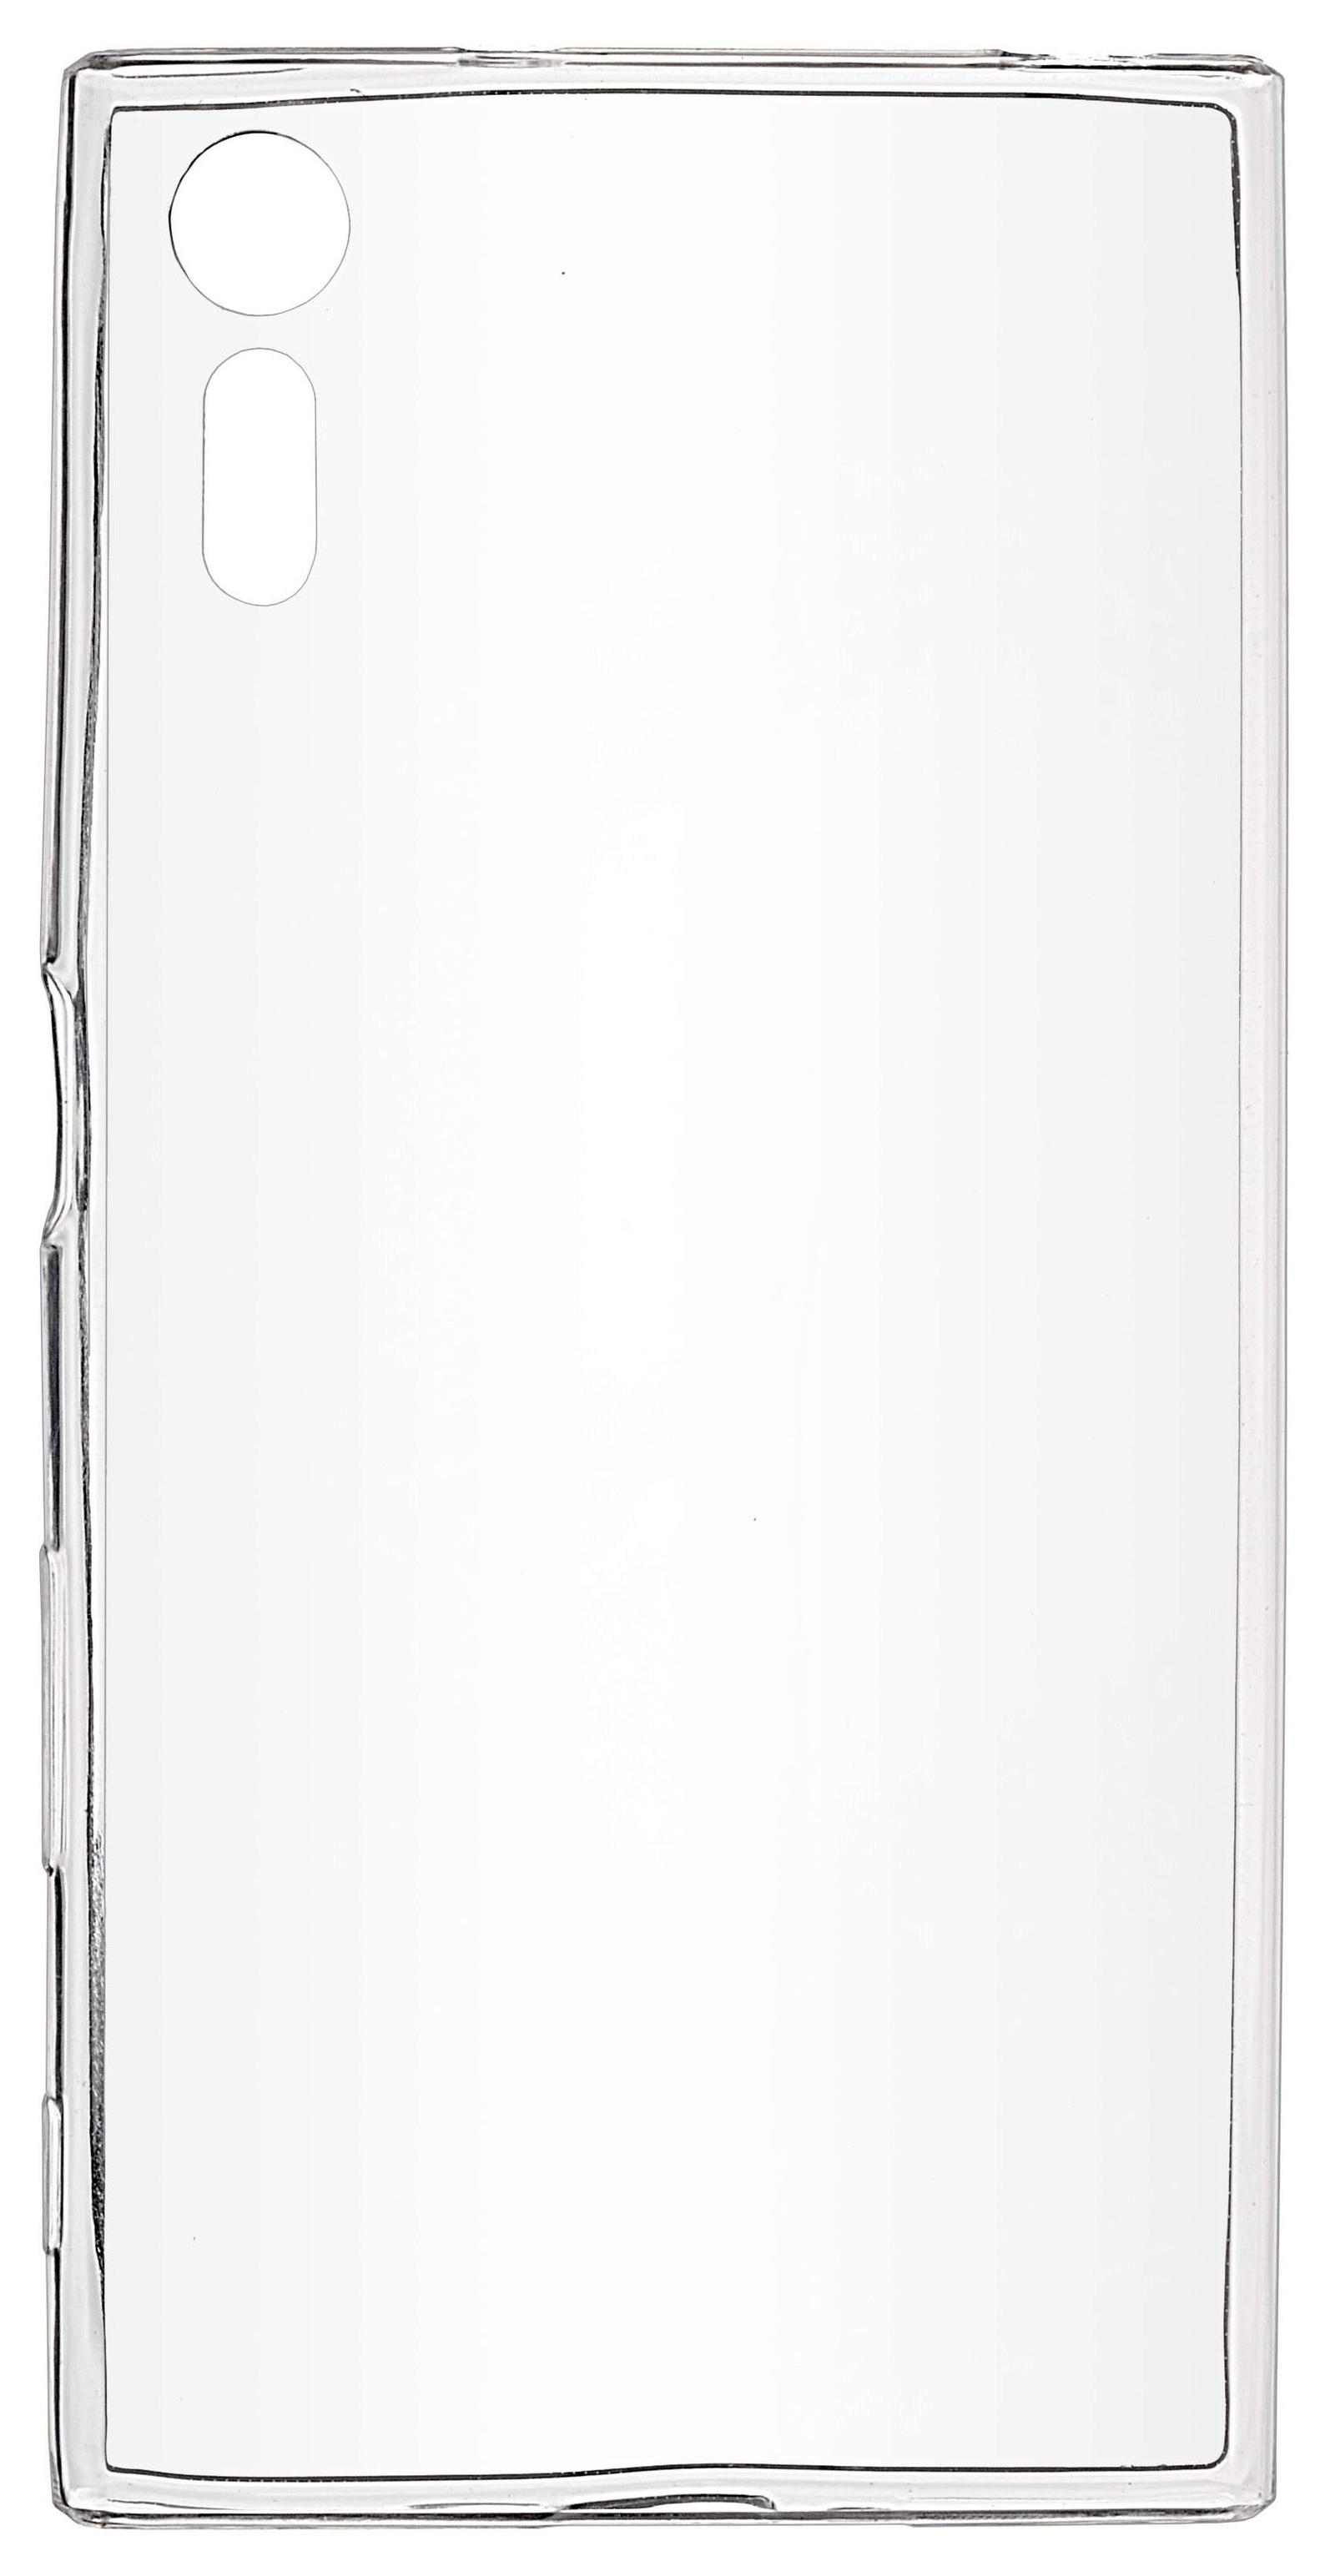 Чехол для сотового телефона skinBOX Slim Silicone, 4630042524705, прозрачный чехол для xiaomi redmi pro skinbox 4people slim silicone case прозрачный